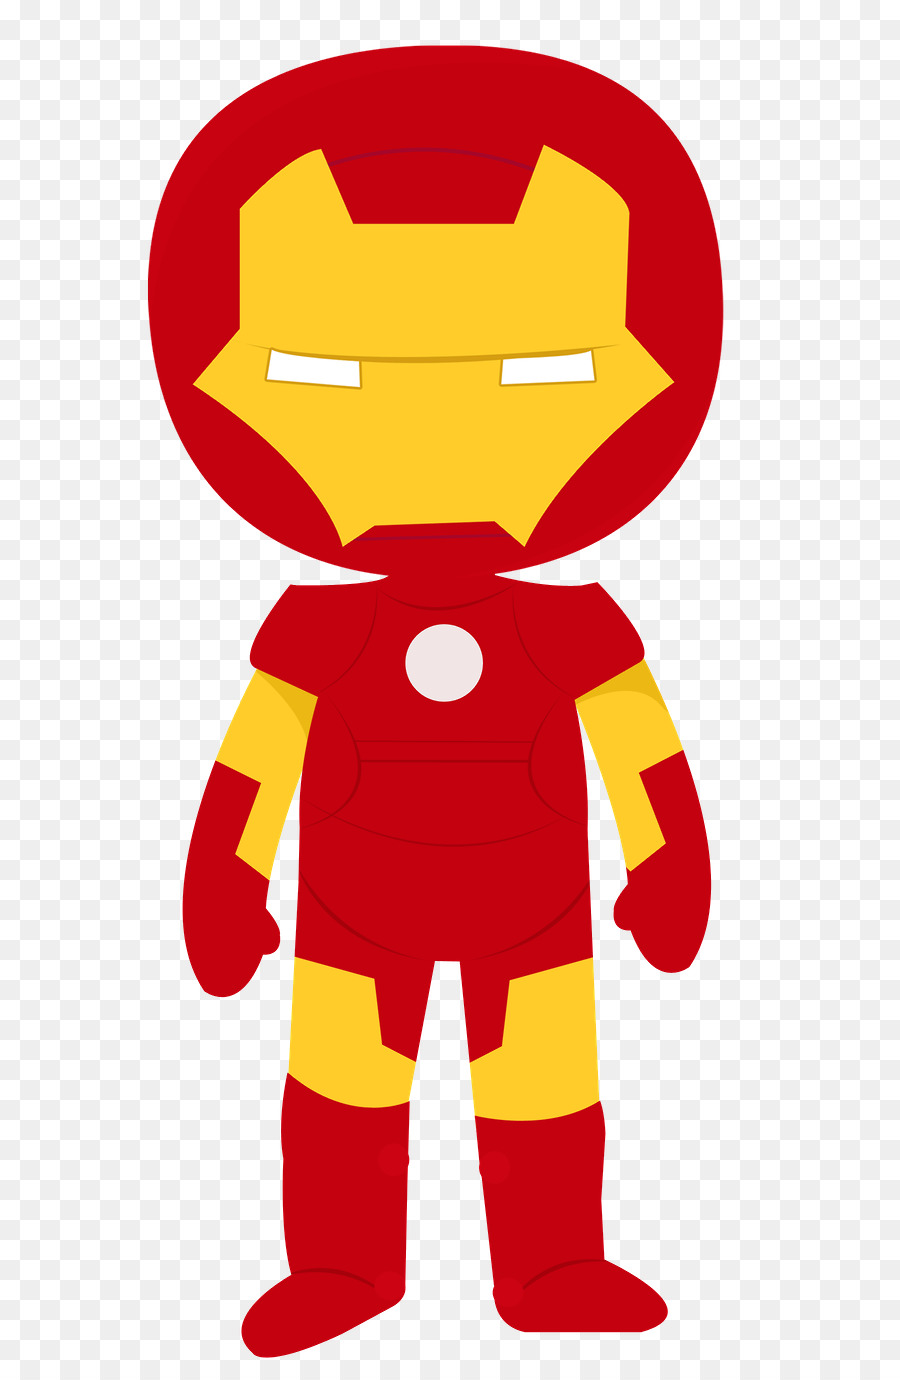 900x1380 Thor Iron Man Superhero Clip Art